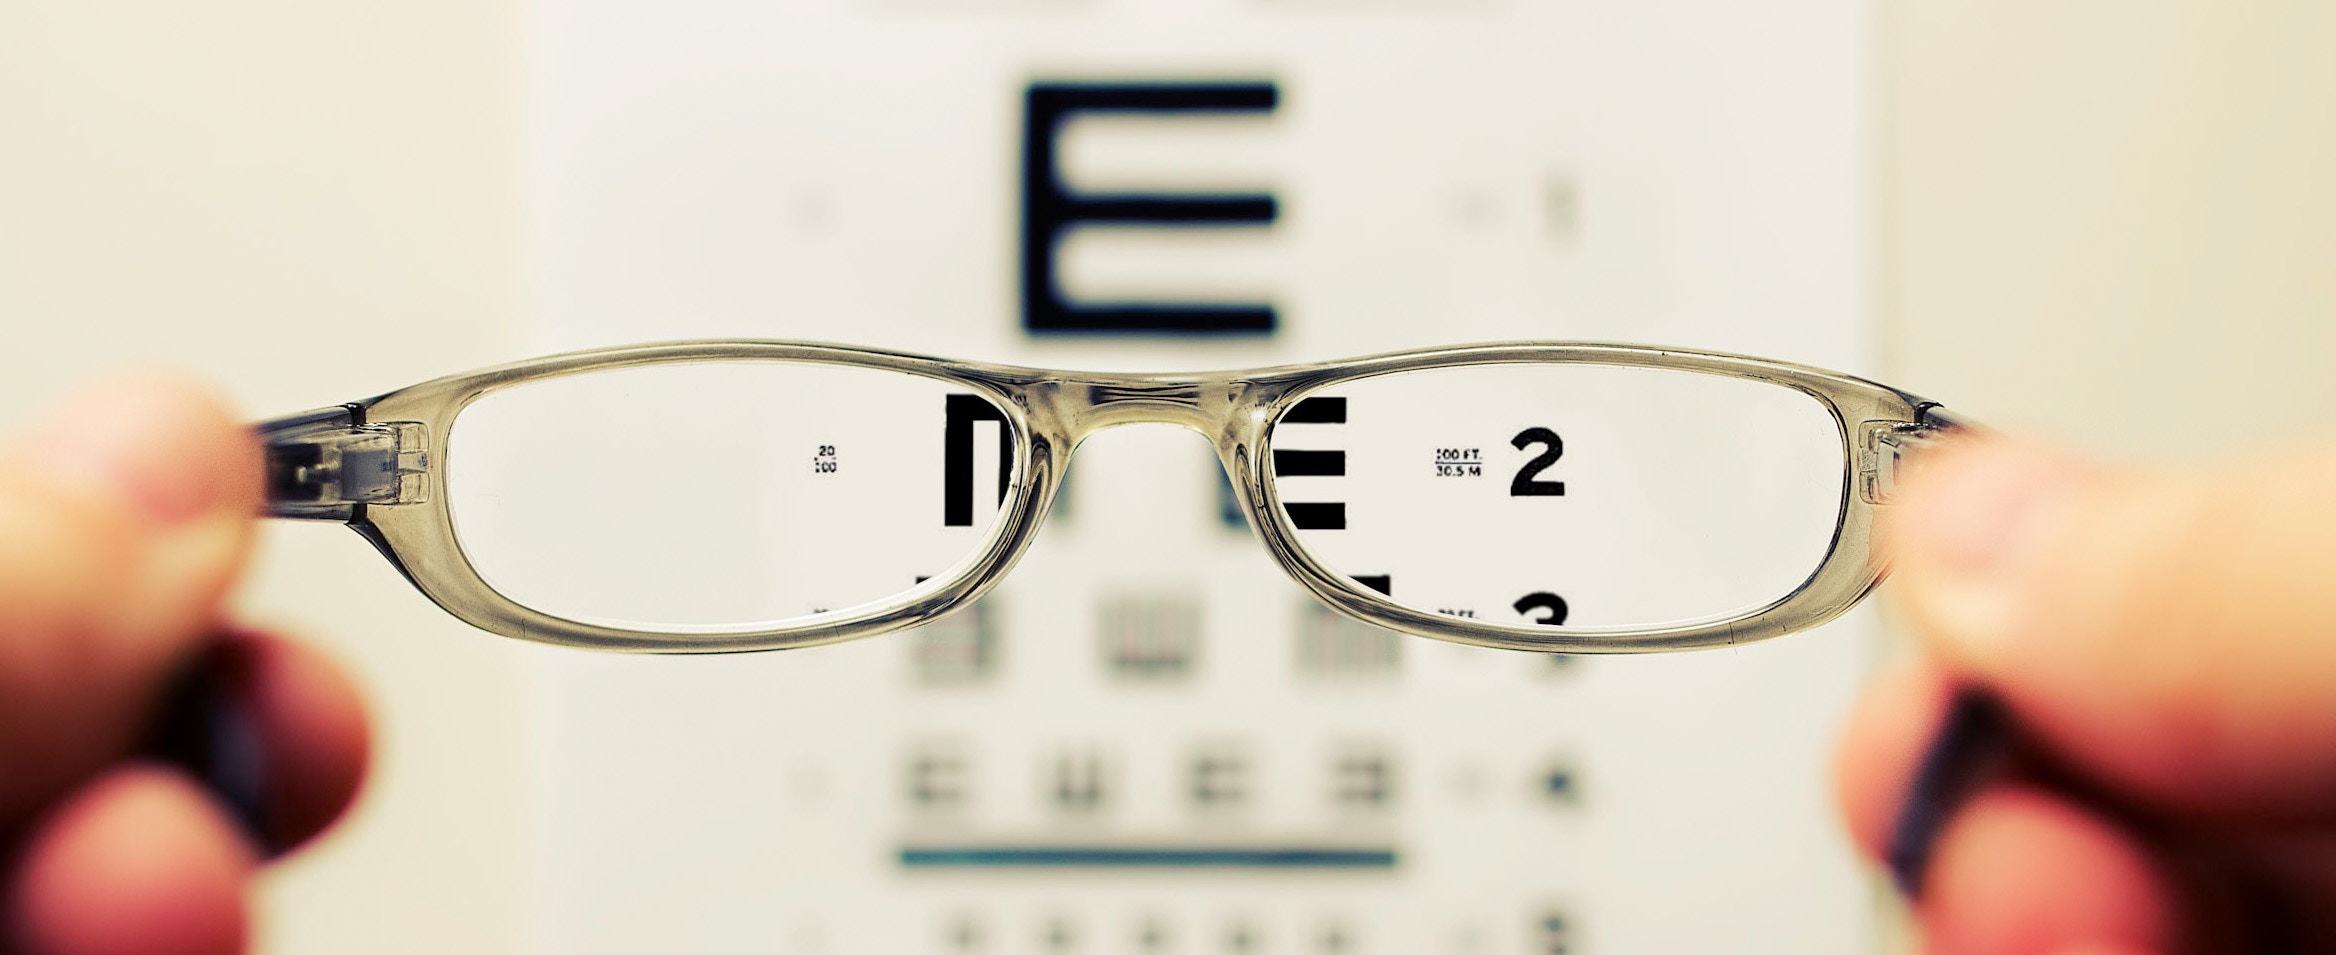 Vision test - hands holding eye glasses.